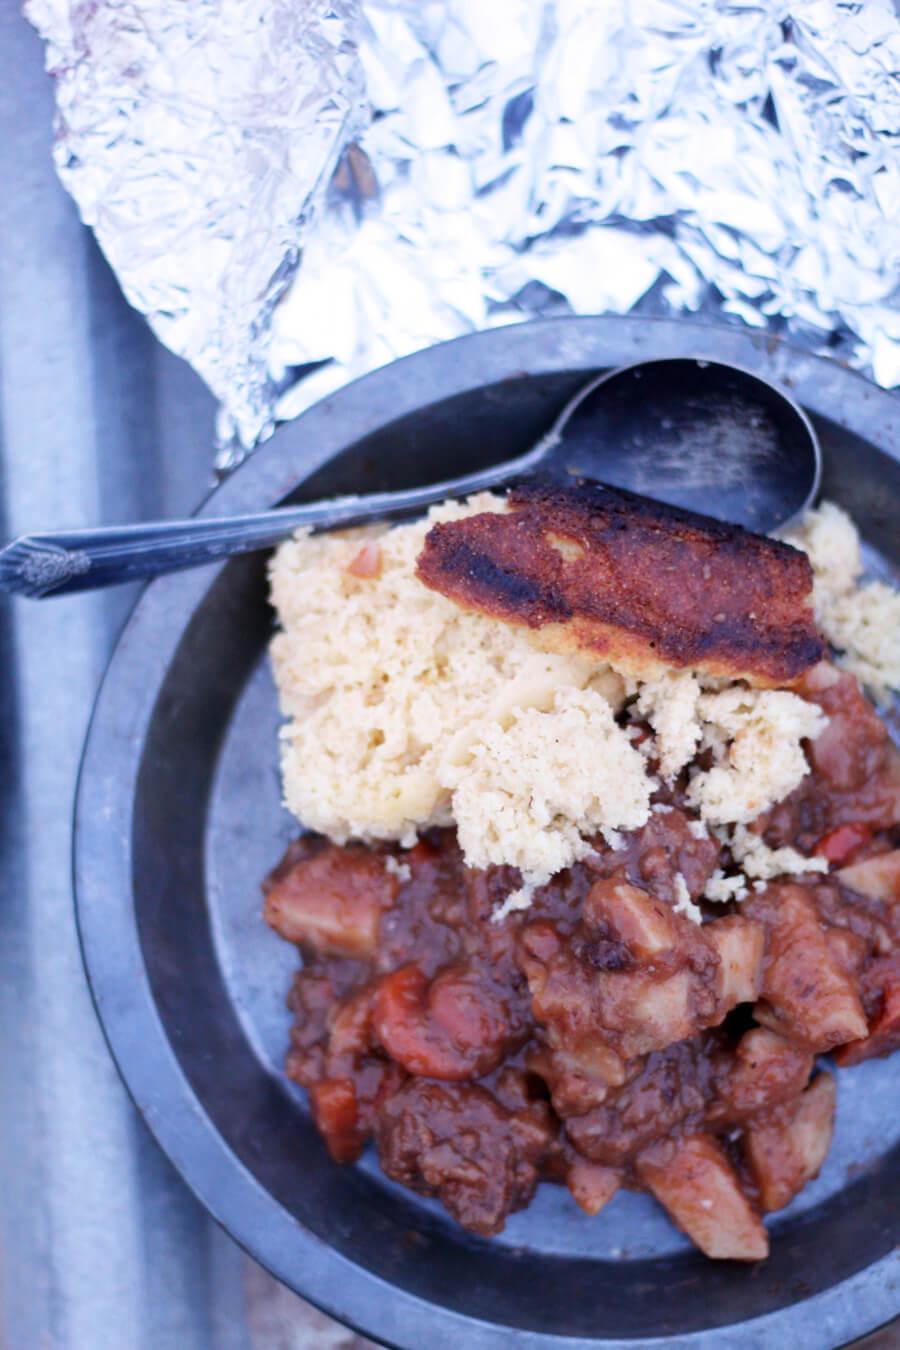 Campfire Skillet Cornbread and Beef Stew